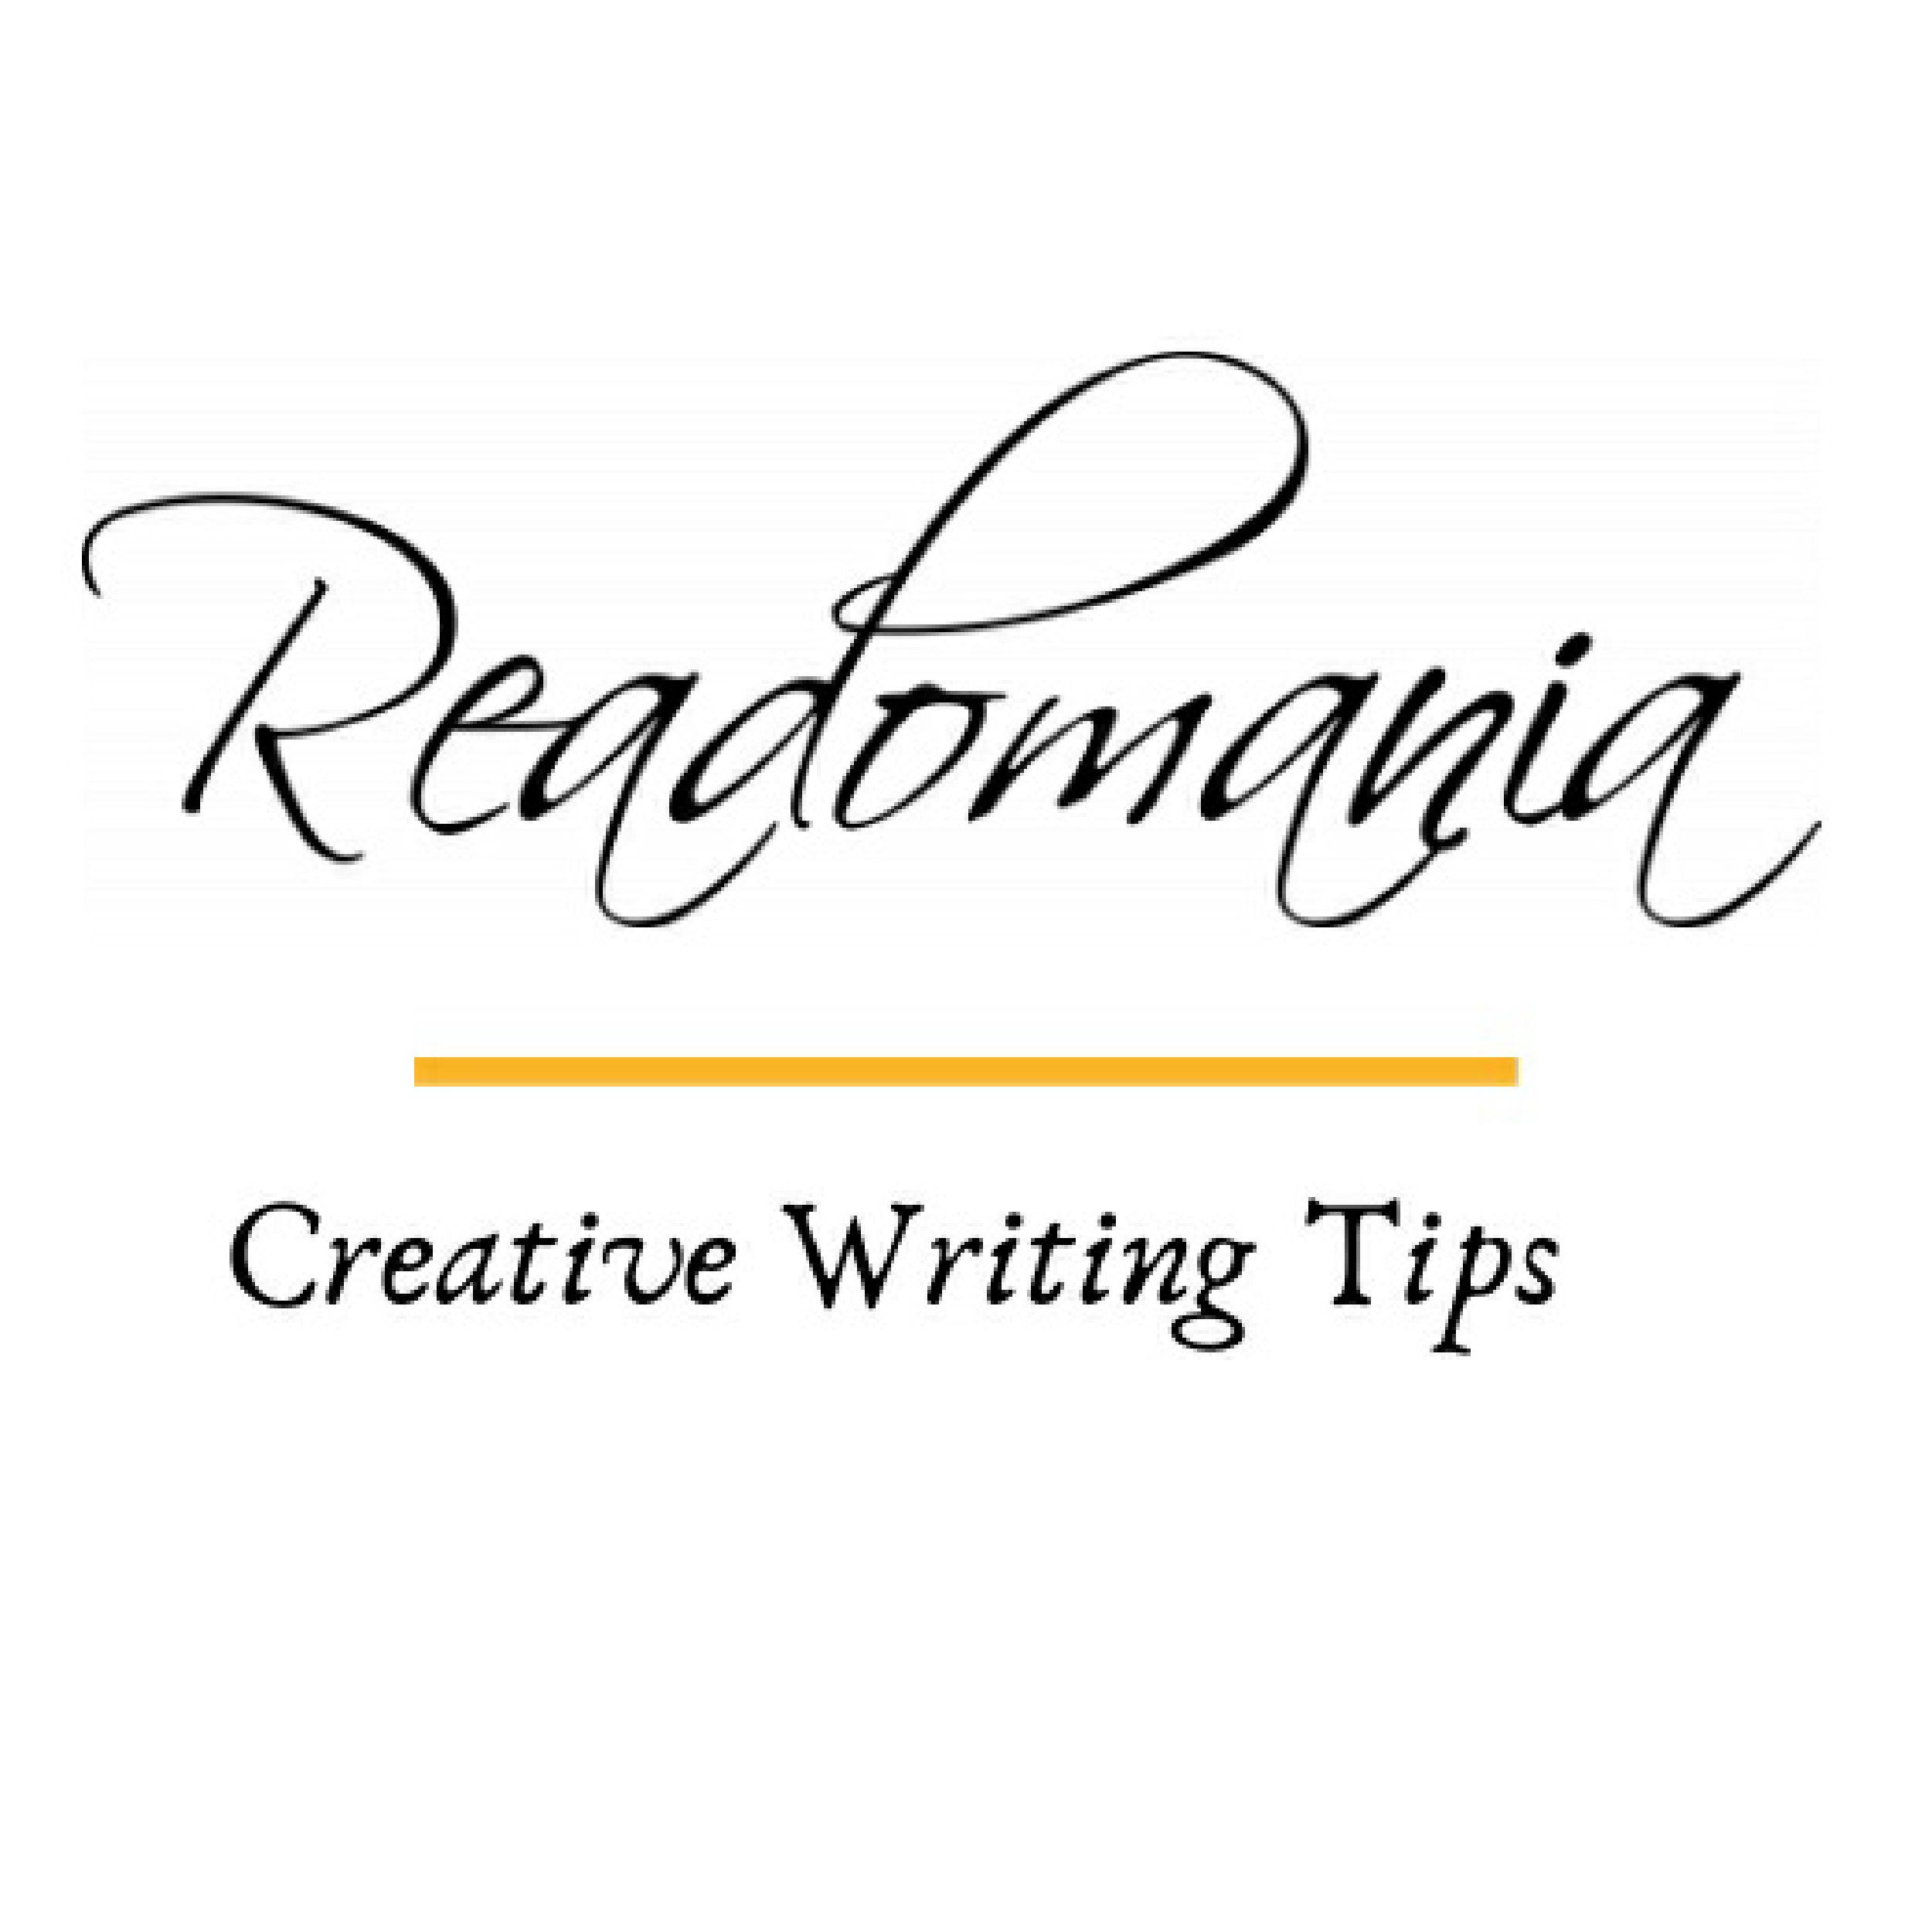 Creative Writing Tips from Readomania